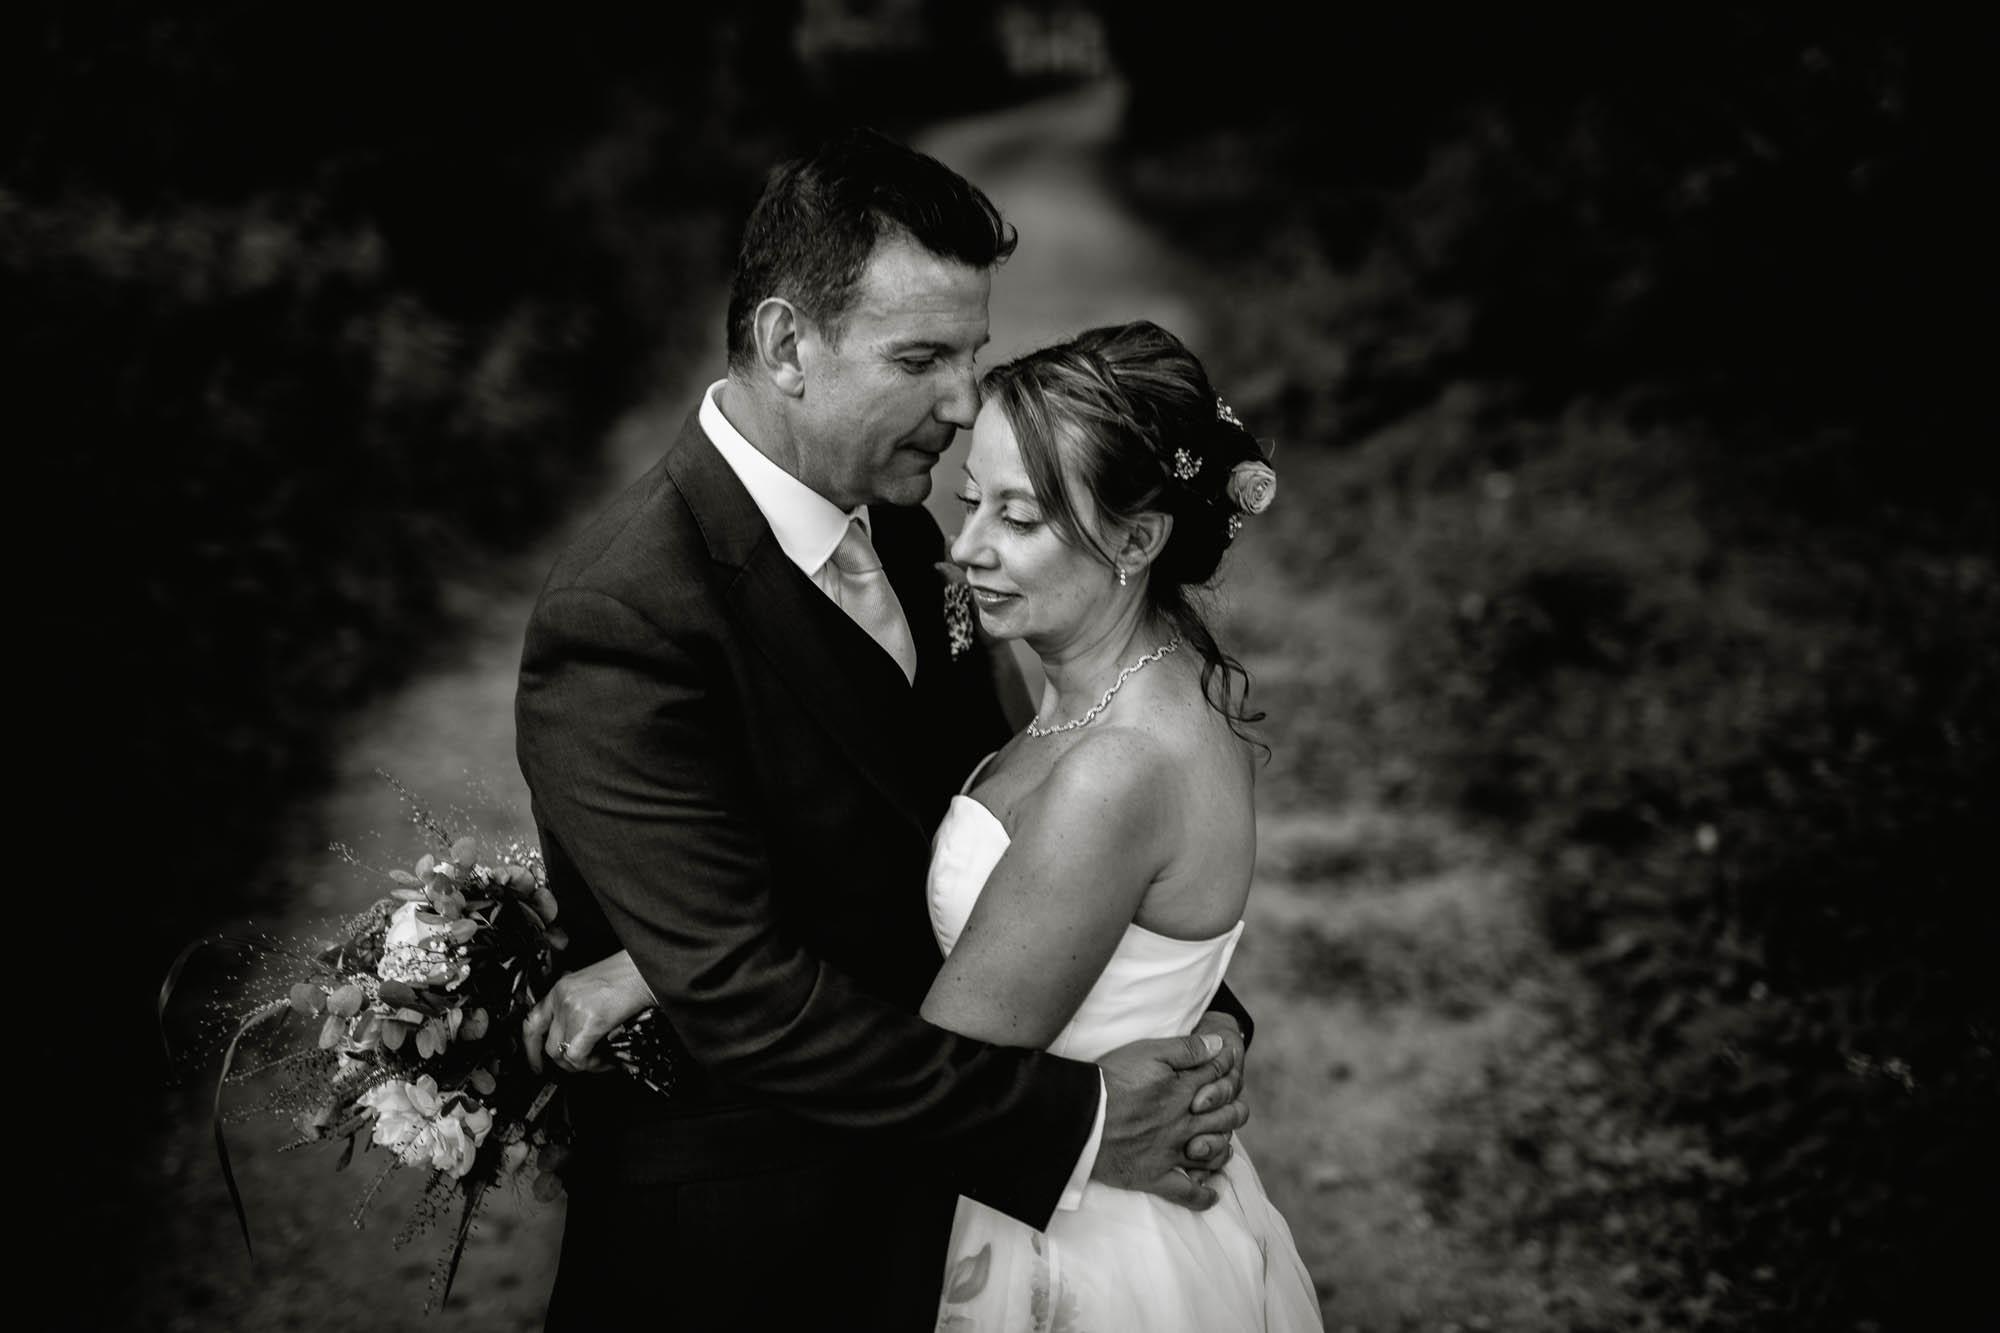 Lythe Hill Hotel Wedding Photography - Gavin and Fiona 21